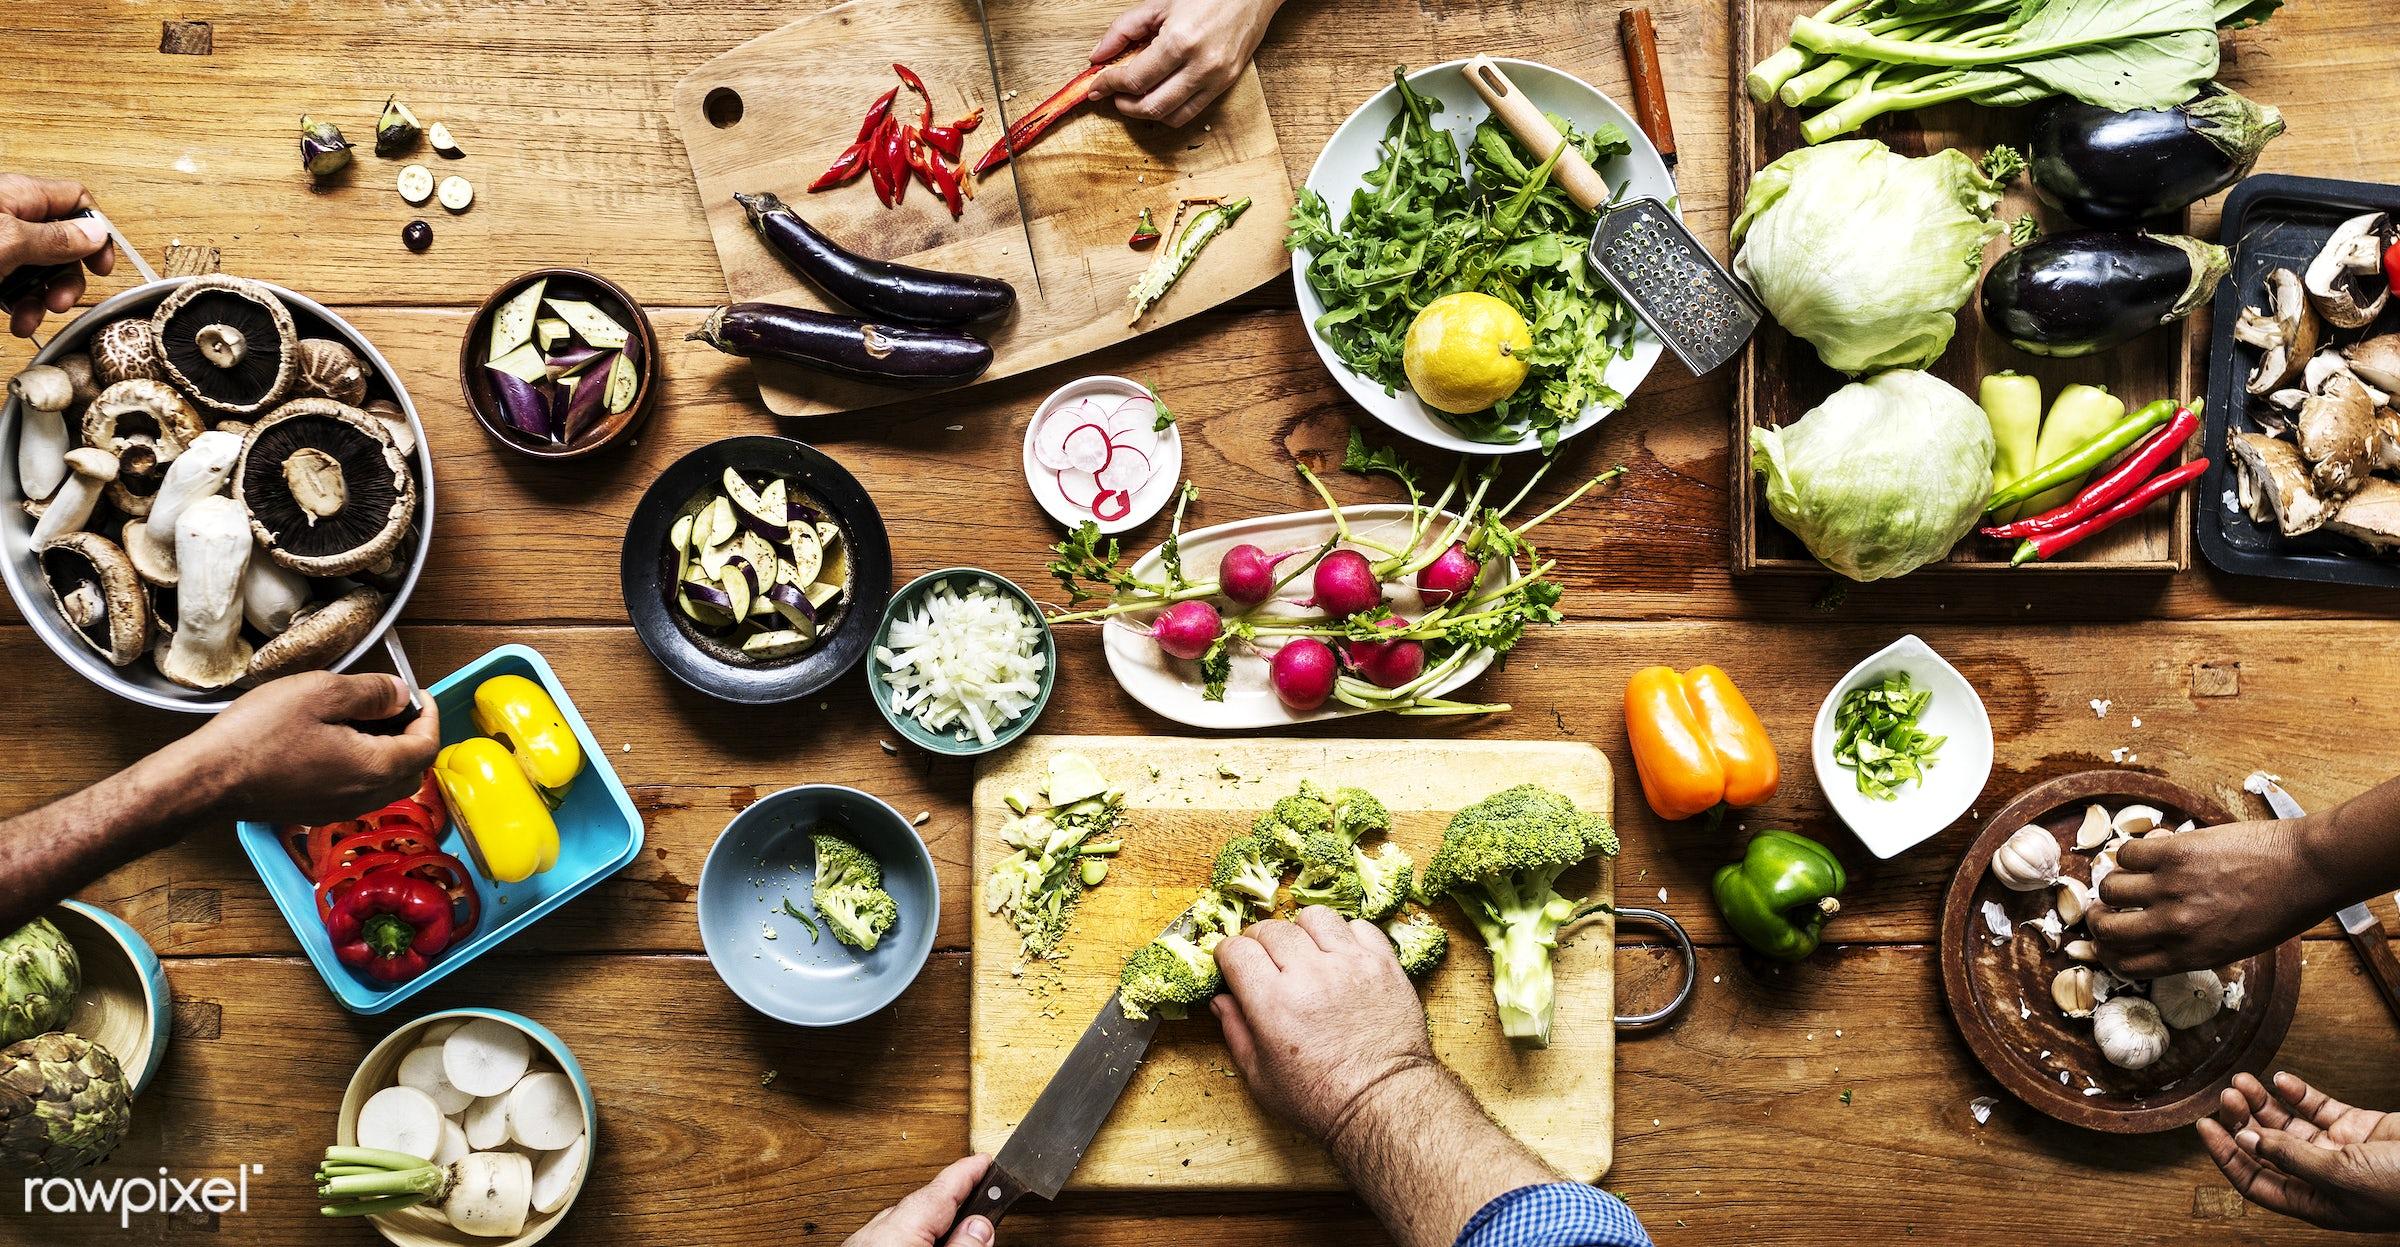 cuisine, variation, chopping board, type, gastronomy, kind, ingredients, broccoli, making, cooking, veggie, preparing, knife...